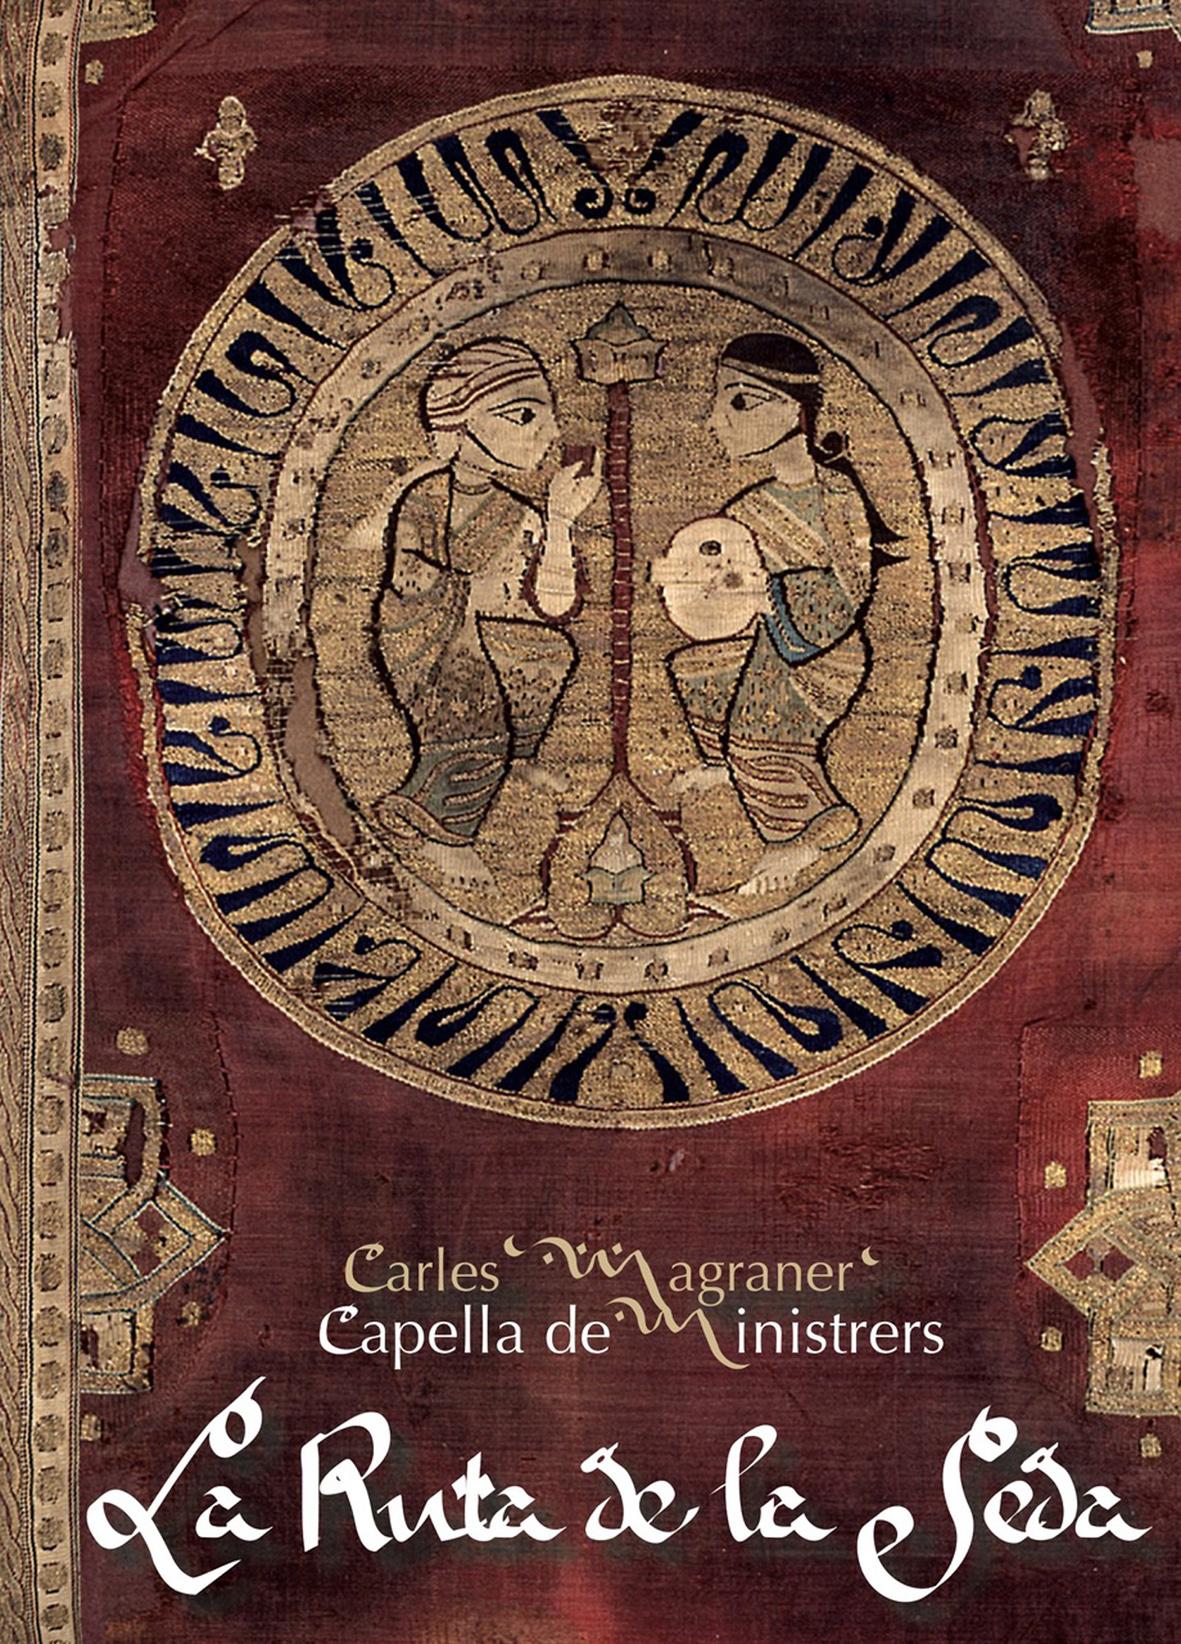 Capella de Ministrers archivos - C O E S S M